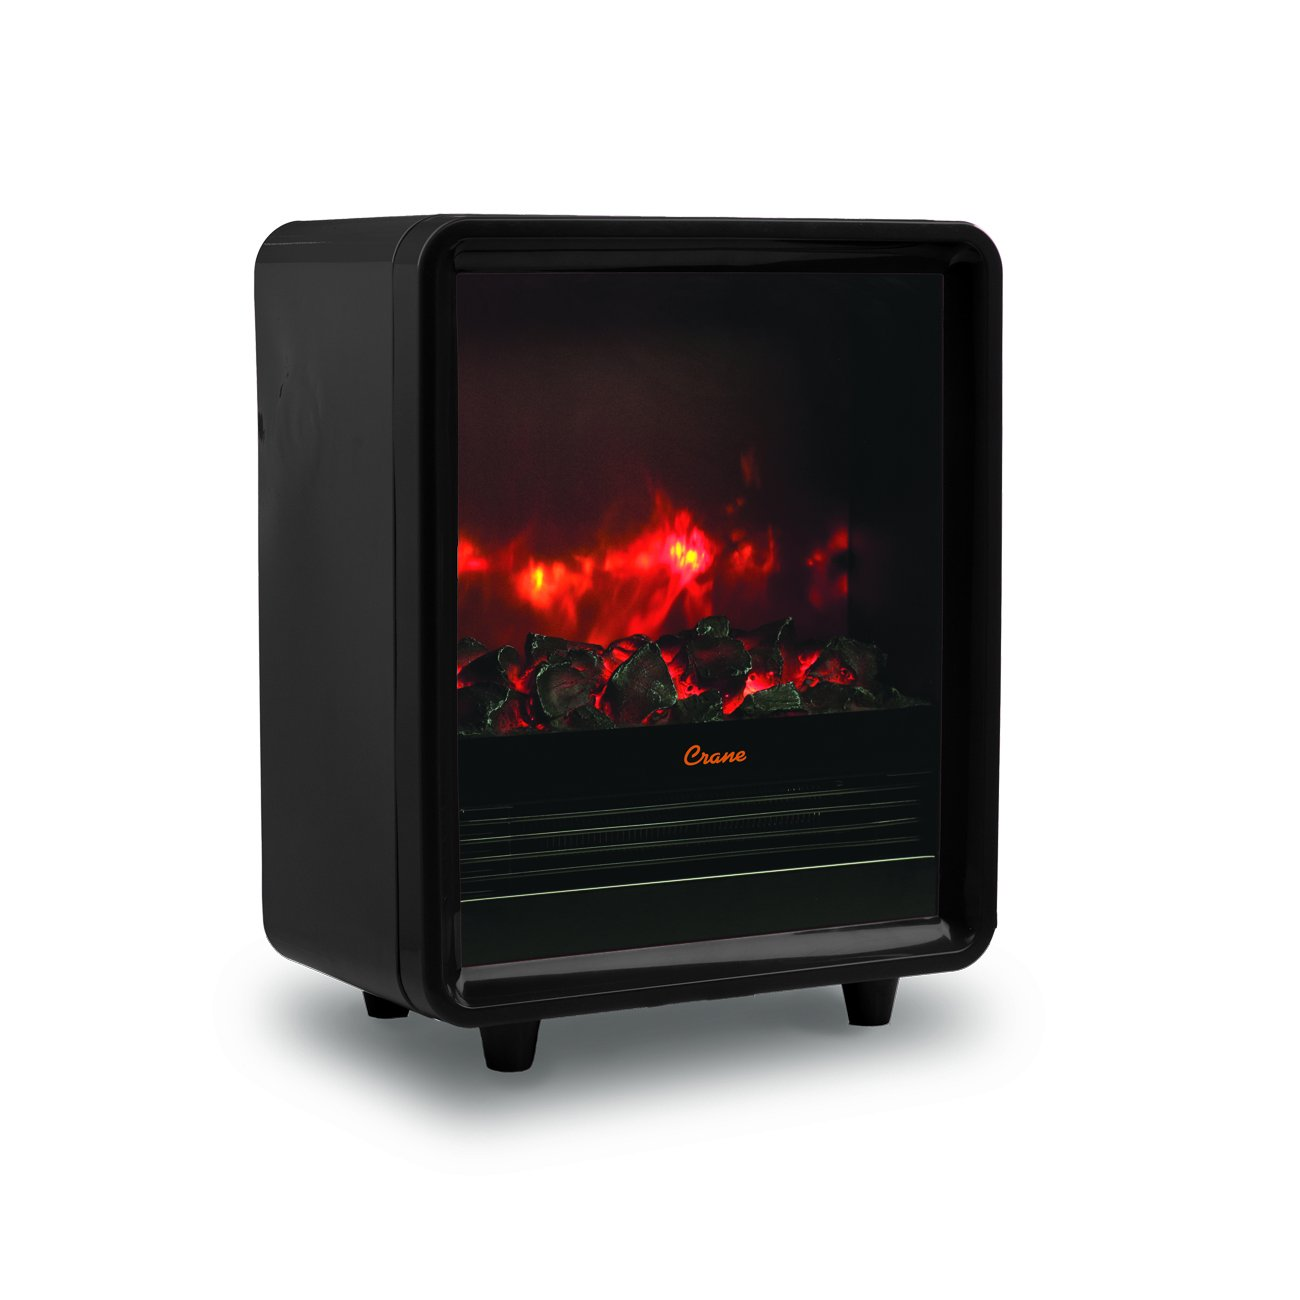 Crane Fireplace Heater - Black